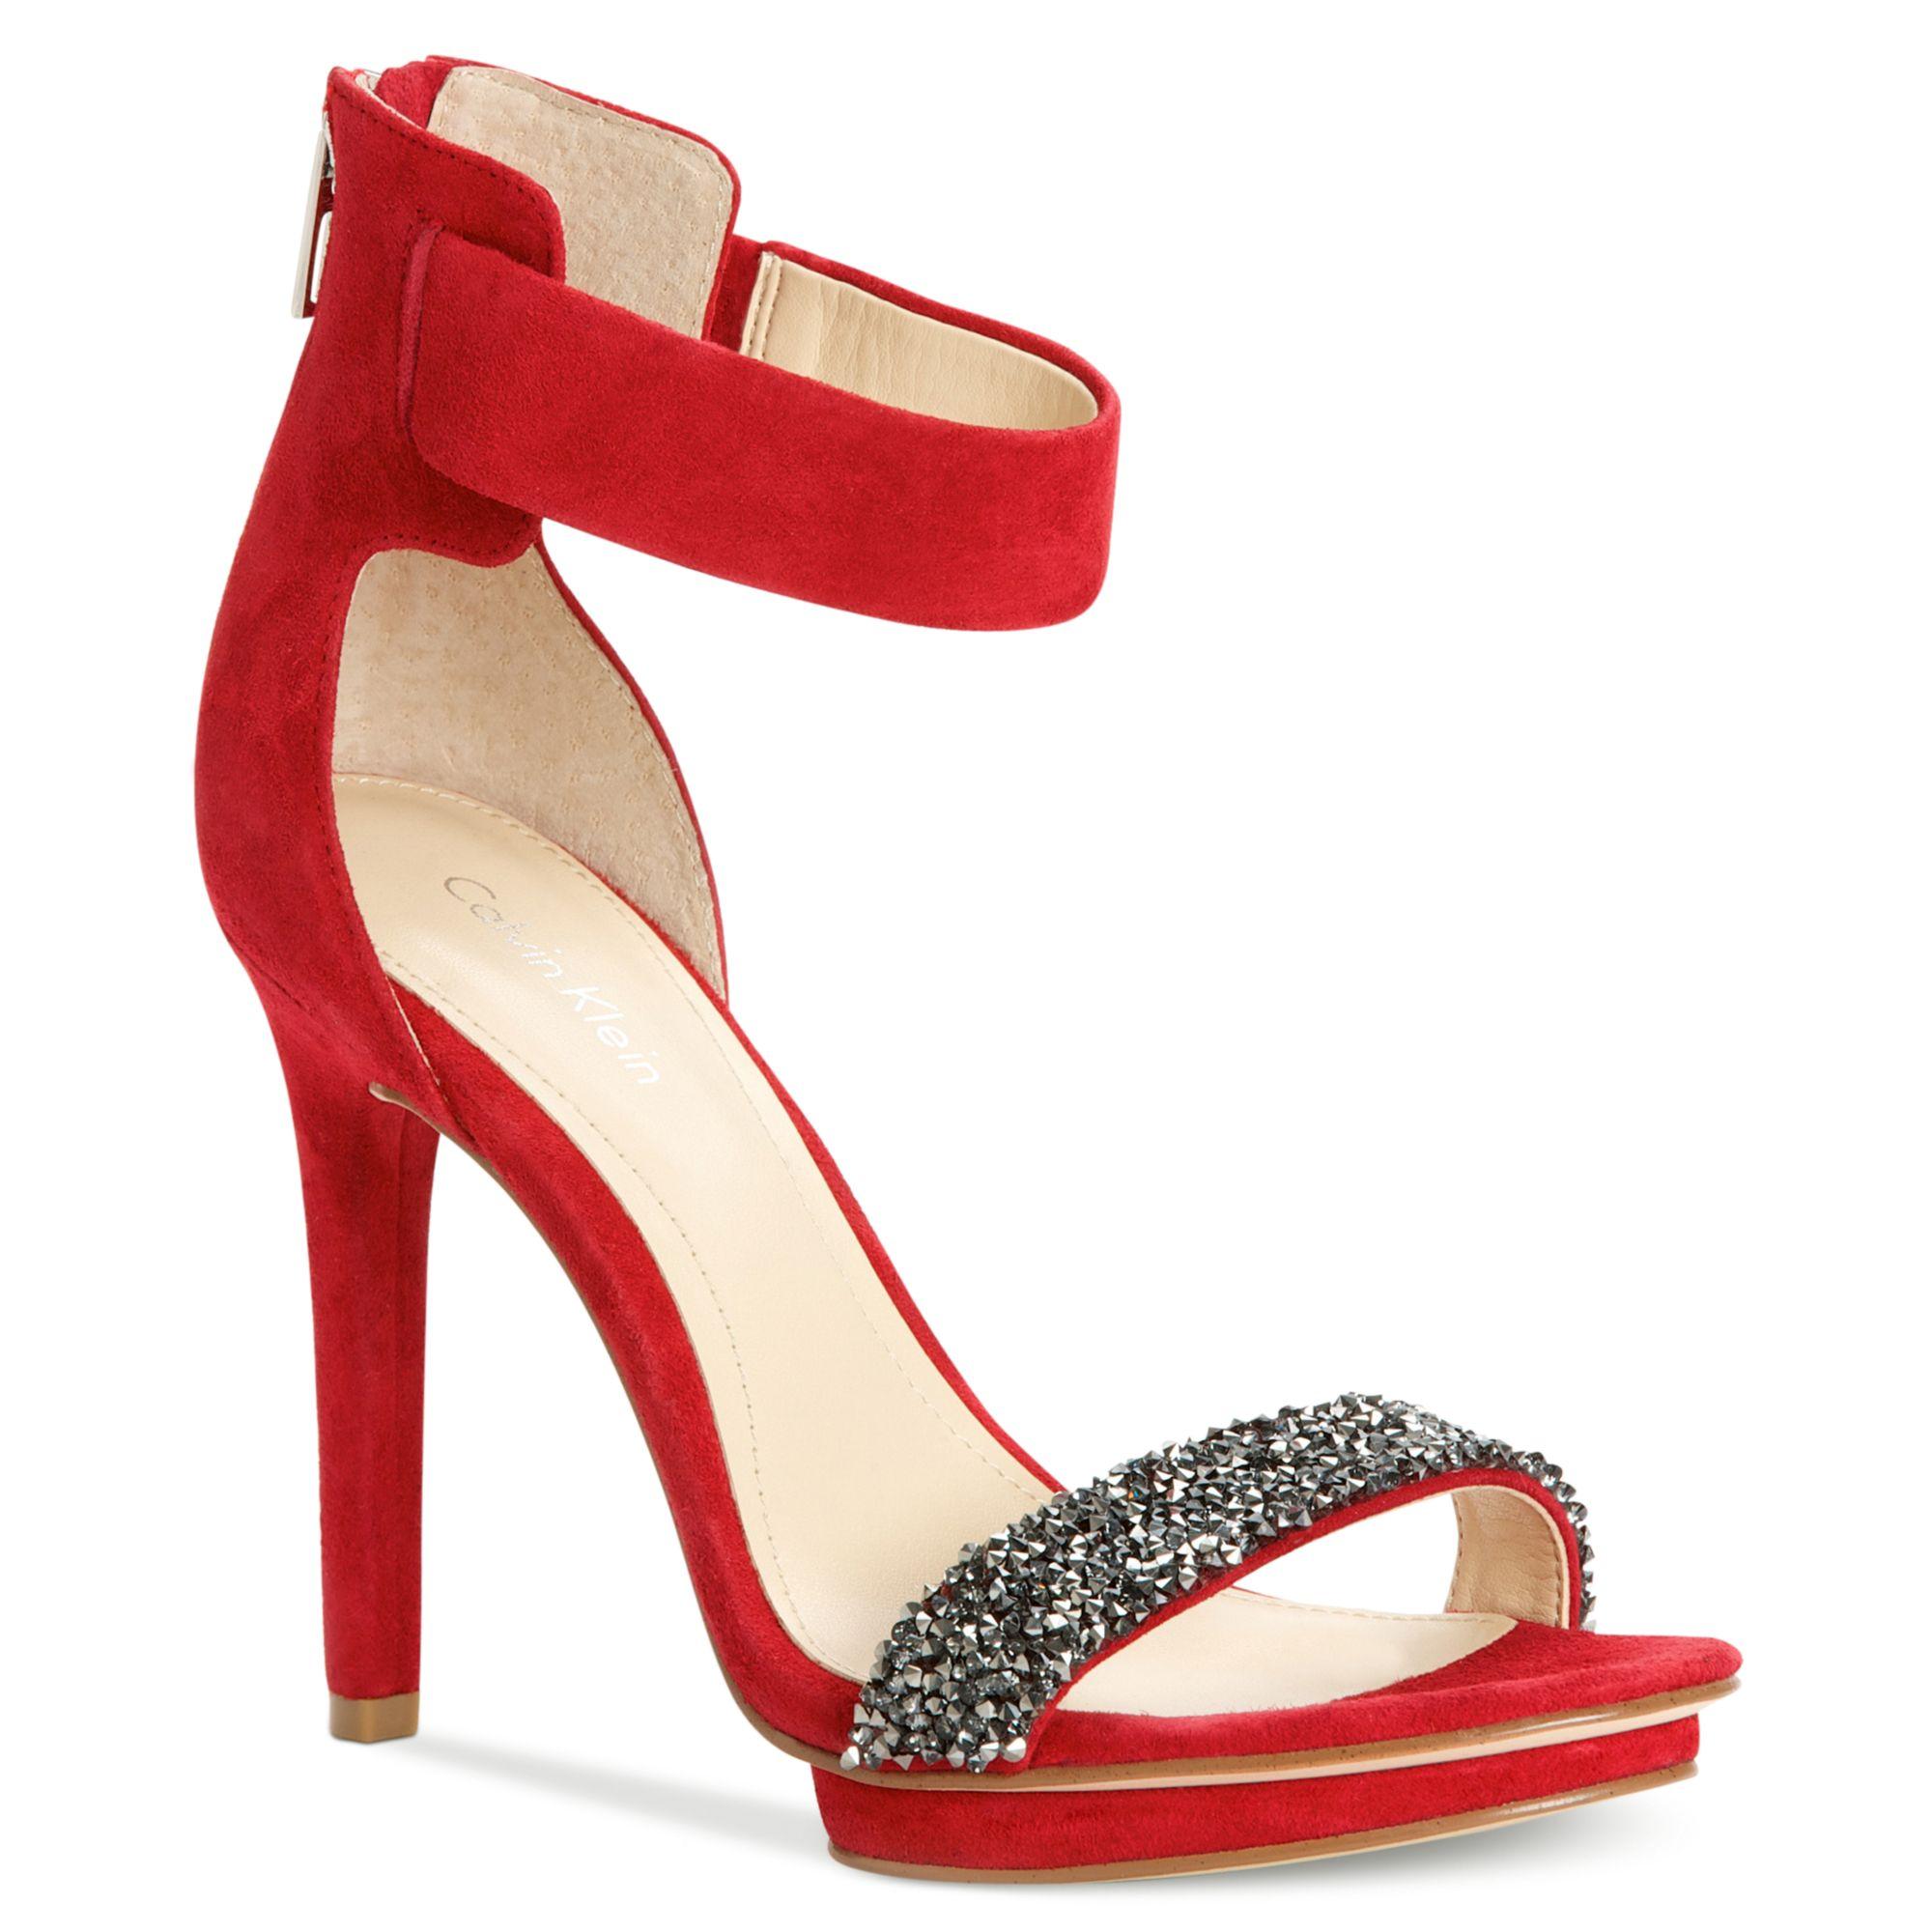 fee14e59544 Calvin Klein Red heels sandal heels